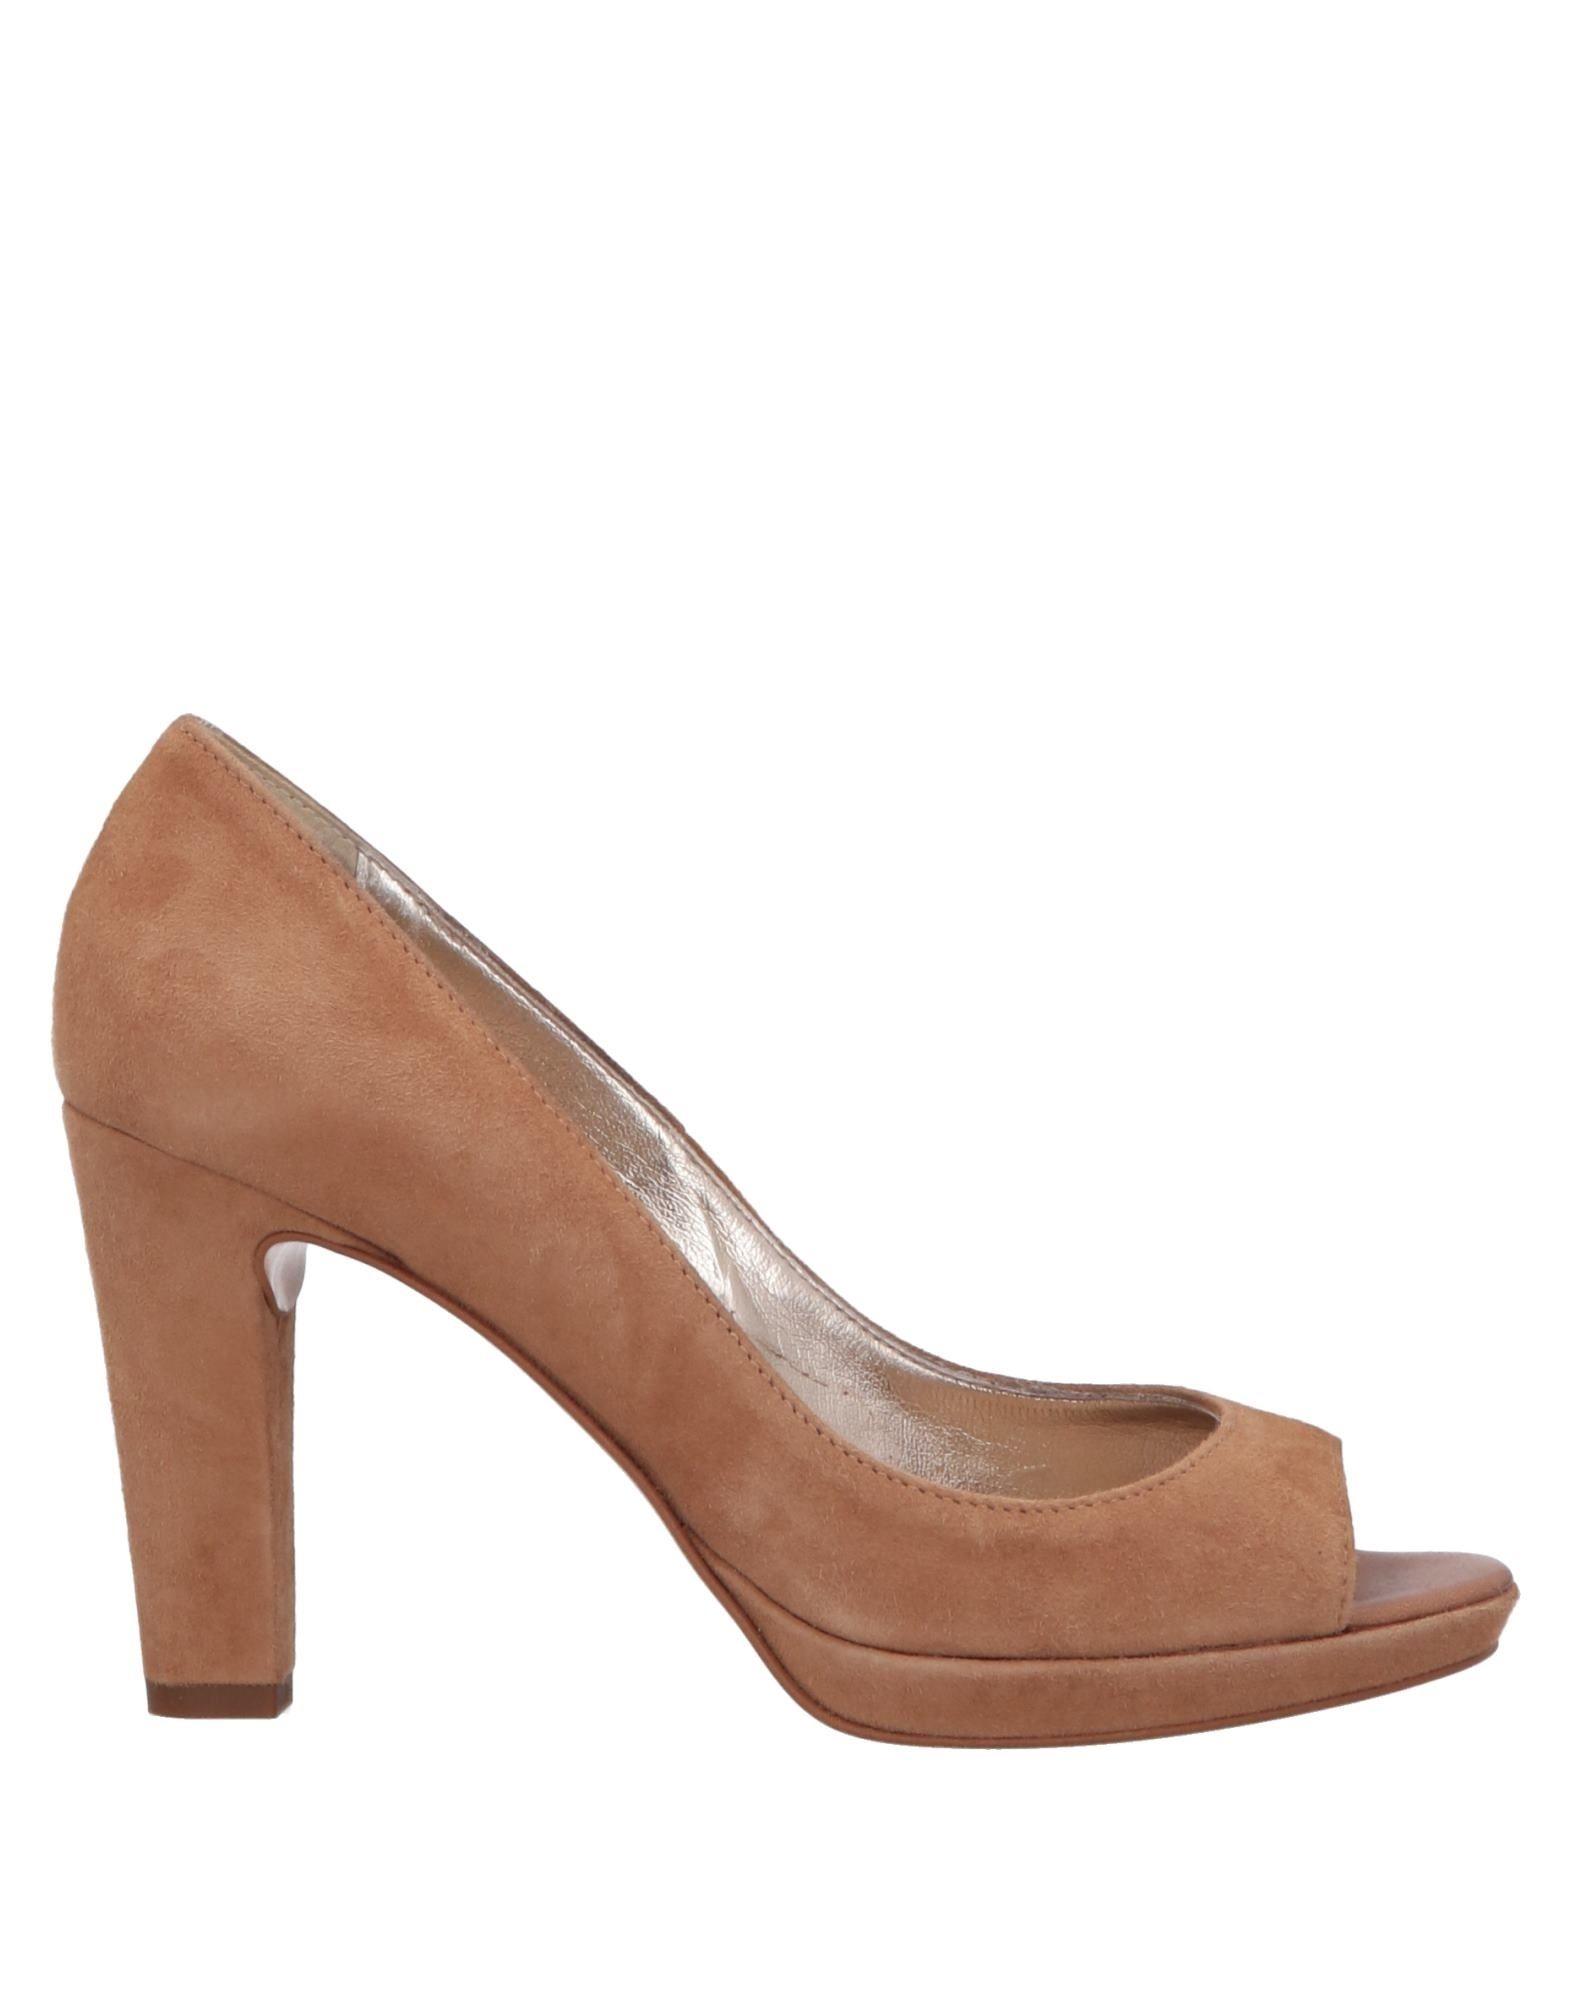 мужские сандалии интернет магазин